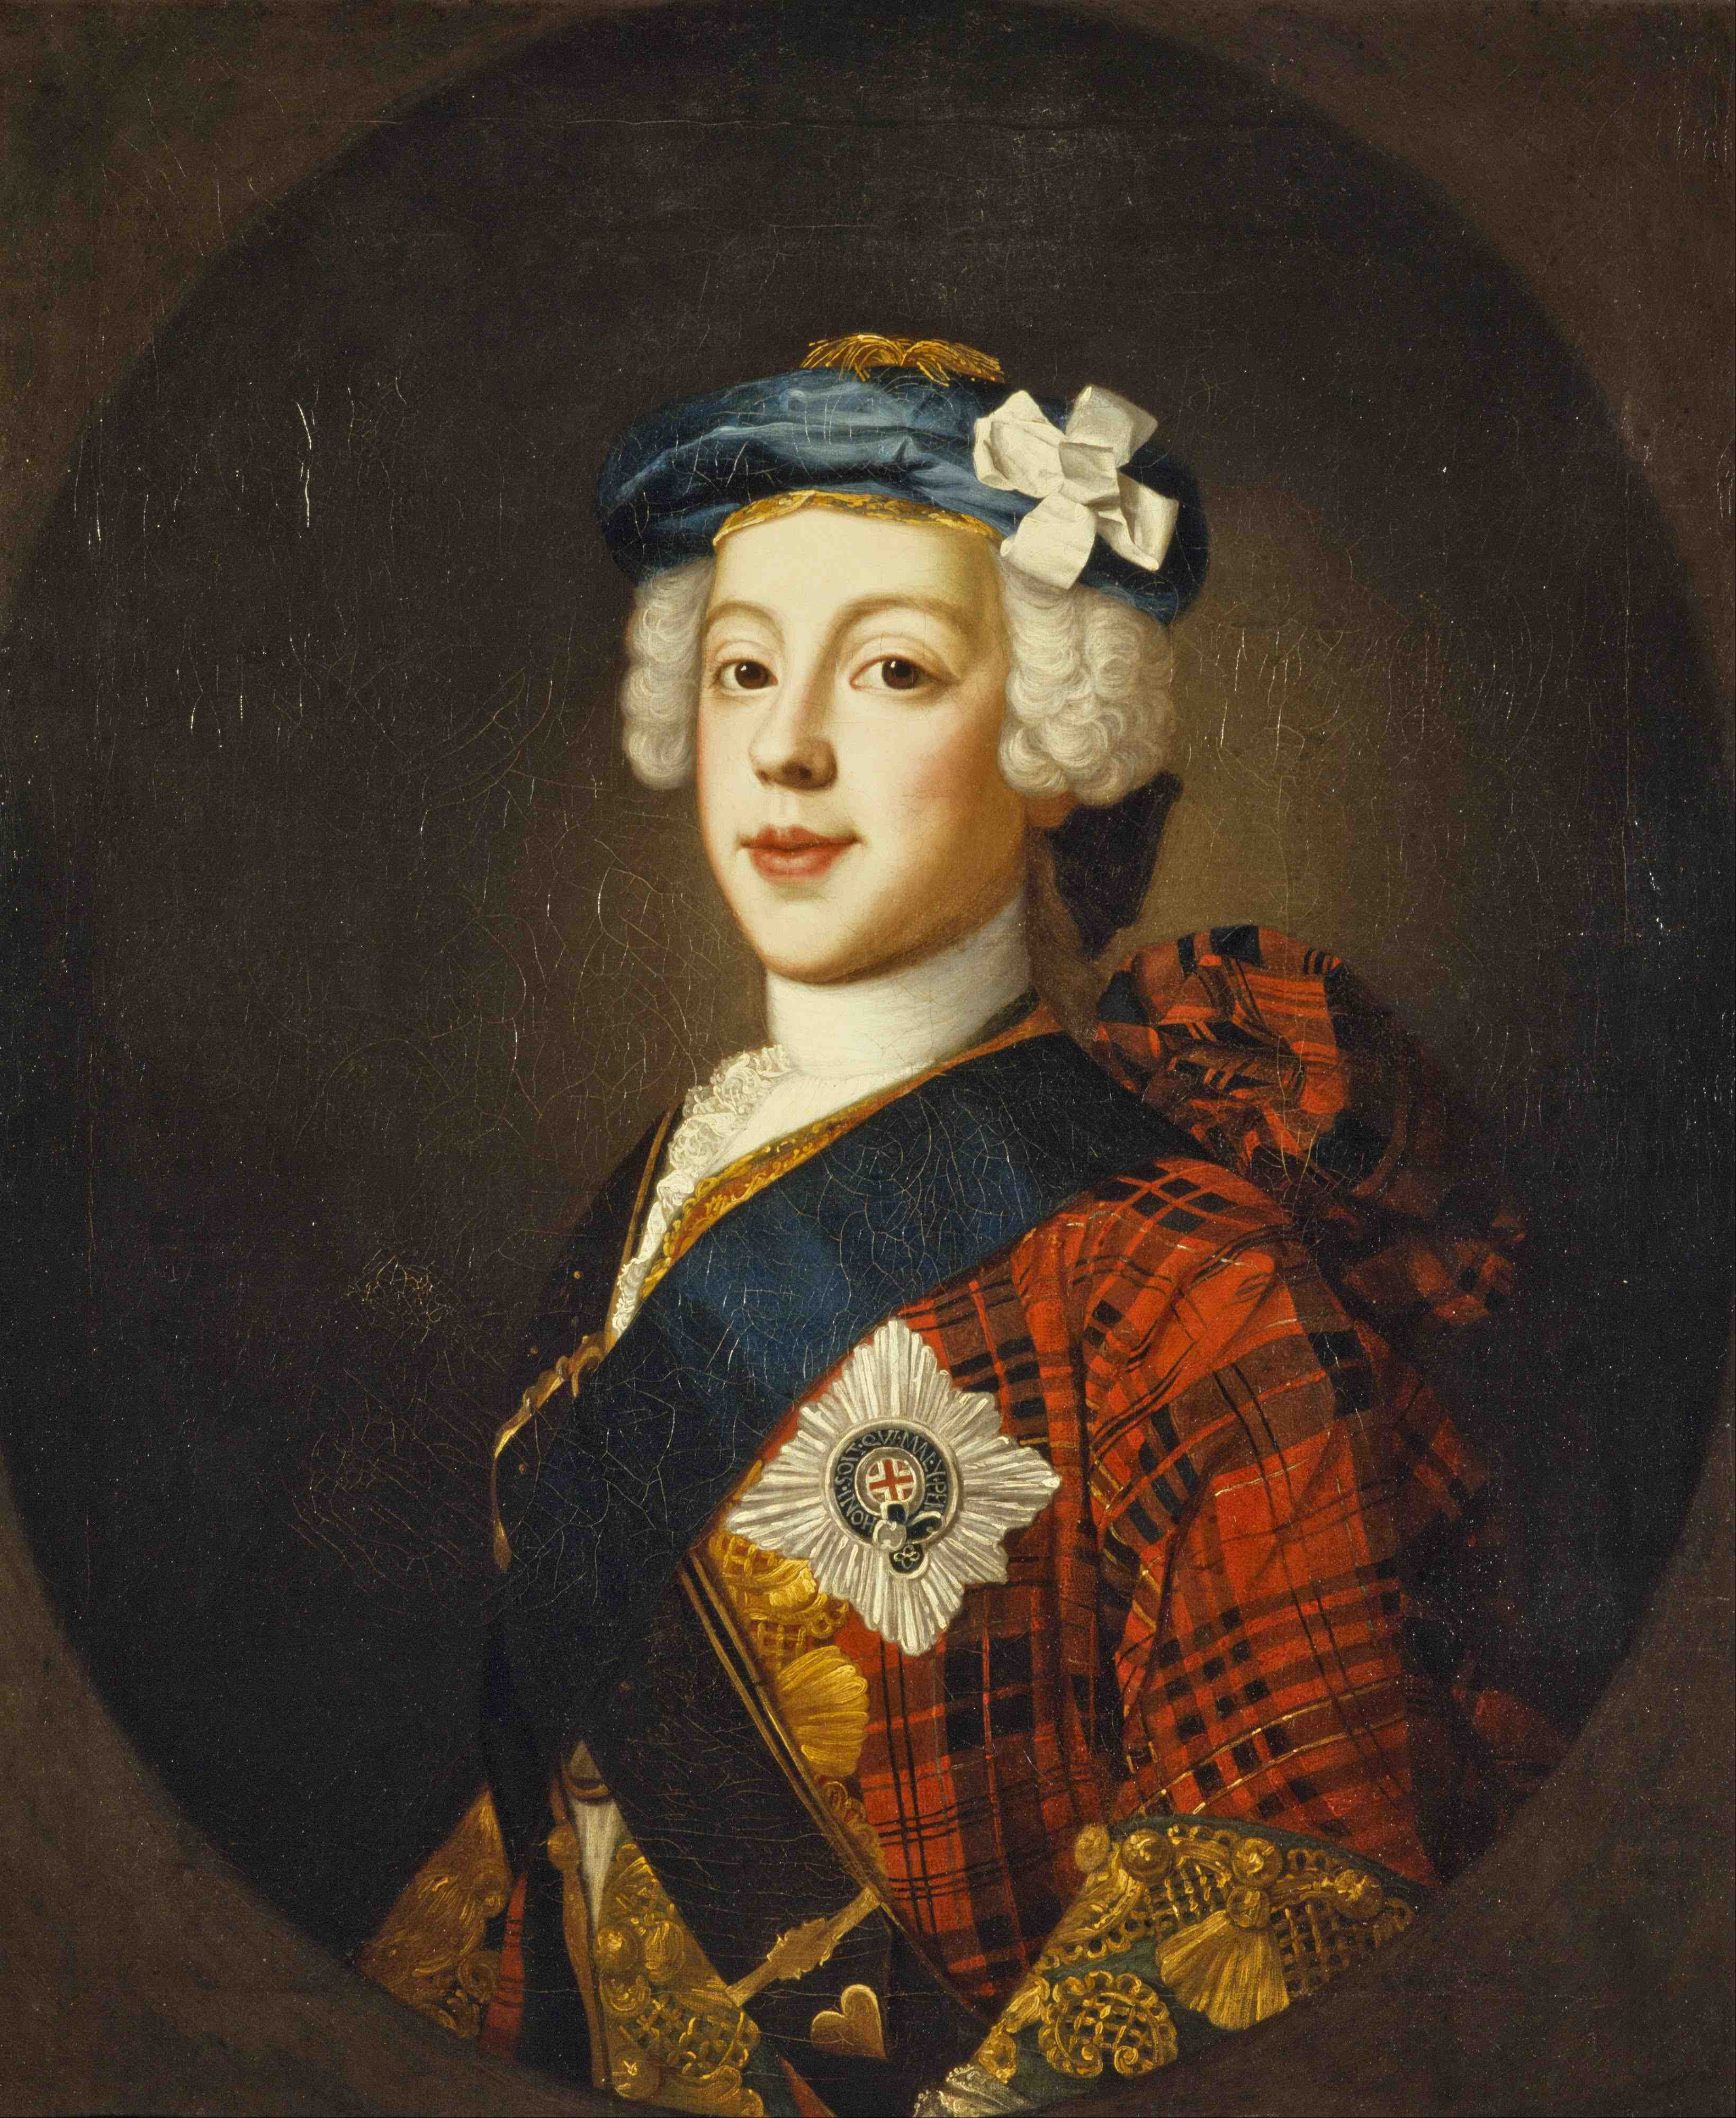 William_Mosman_-_Prince_Charles_Edward_Stuart,_1720_-_1788._Eldest_son_of_Prince_James_Francis_Edward_Stuart_-_Google_Art_Project